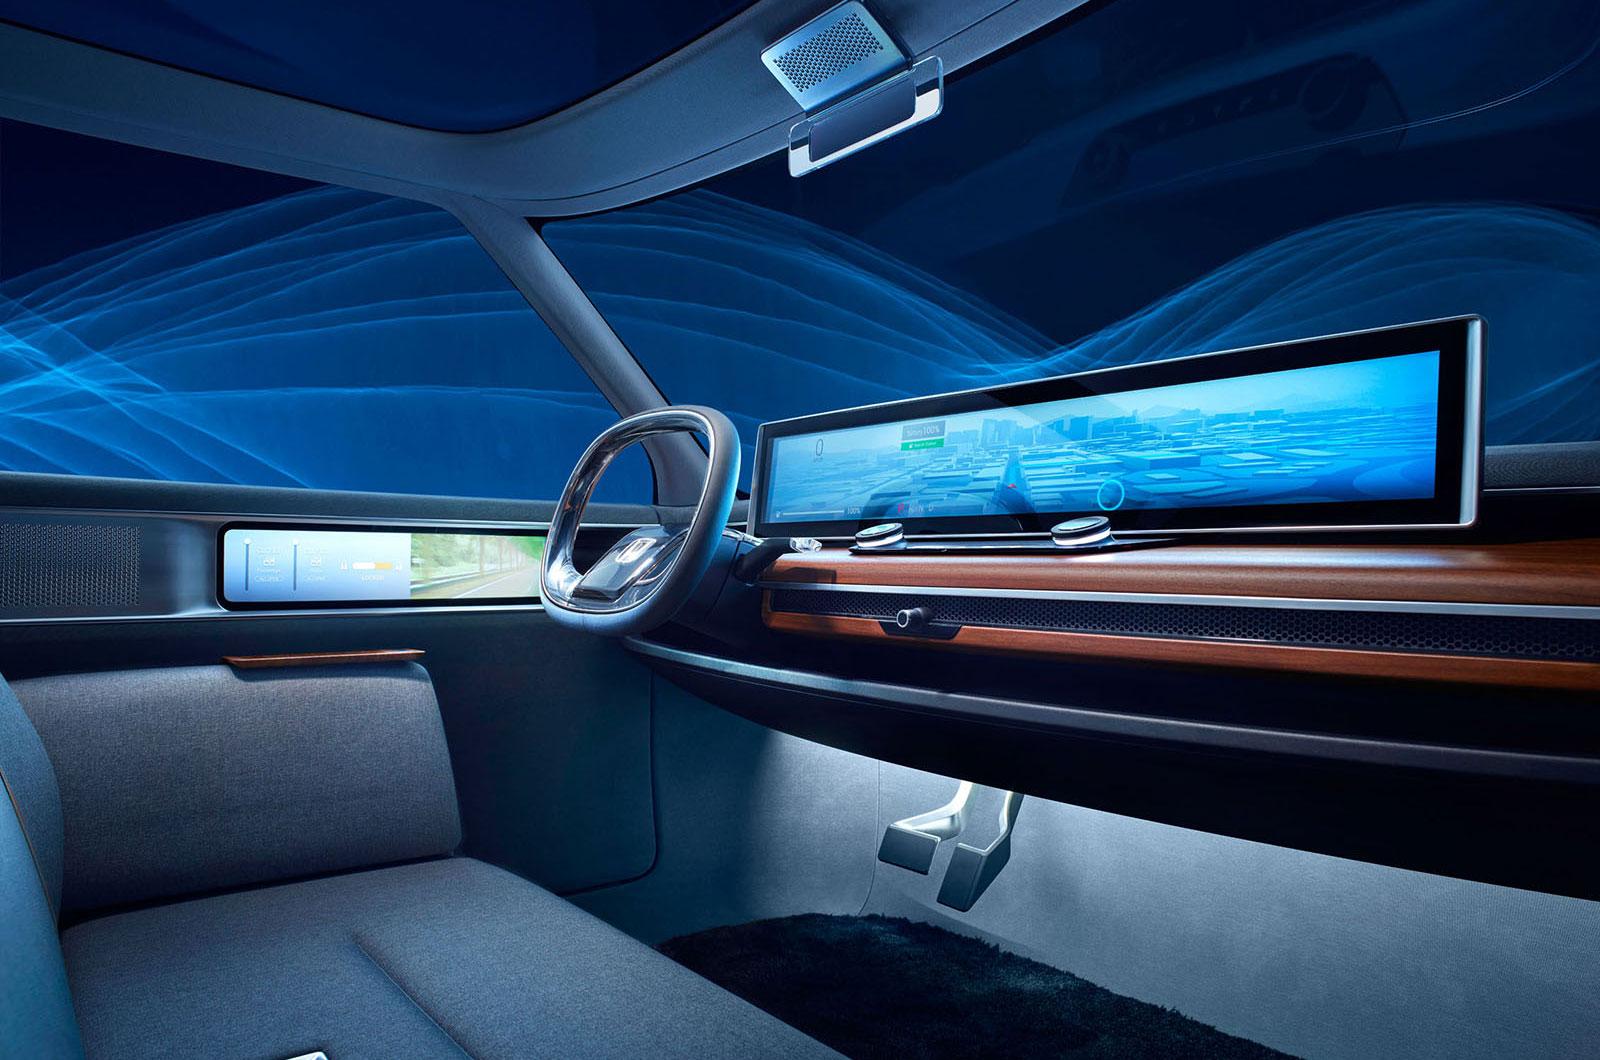 Honda Urban Ev Interior Revealed Ahead Of Geneva Debut Autocar